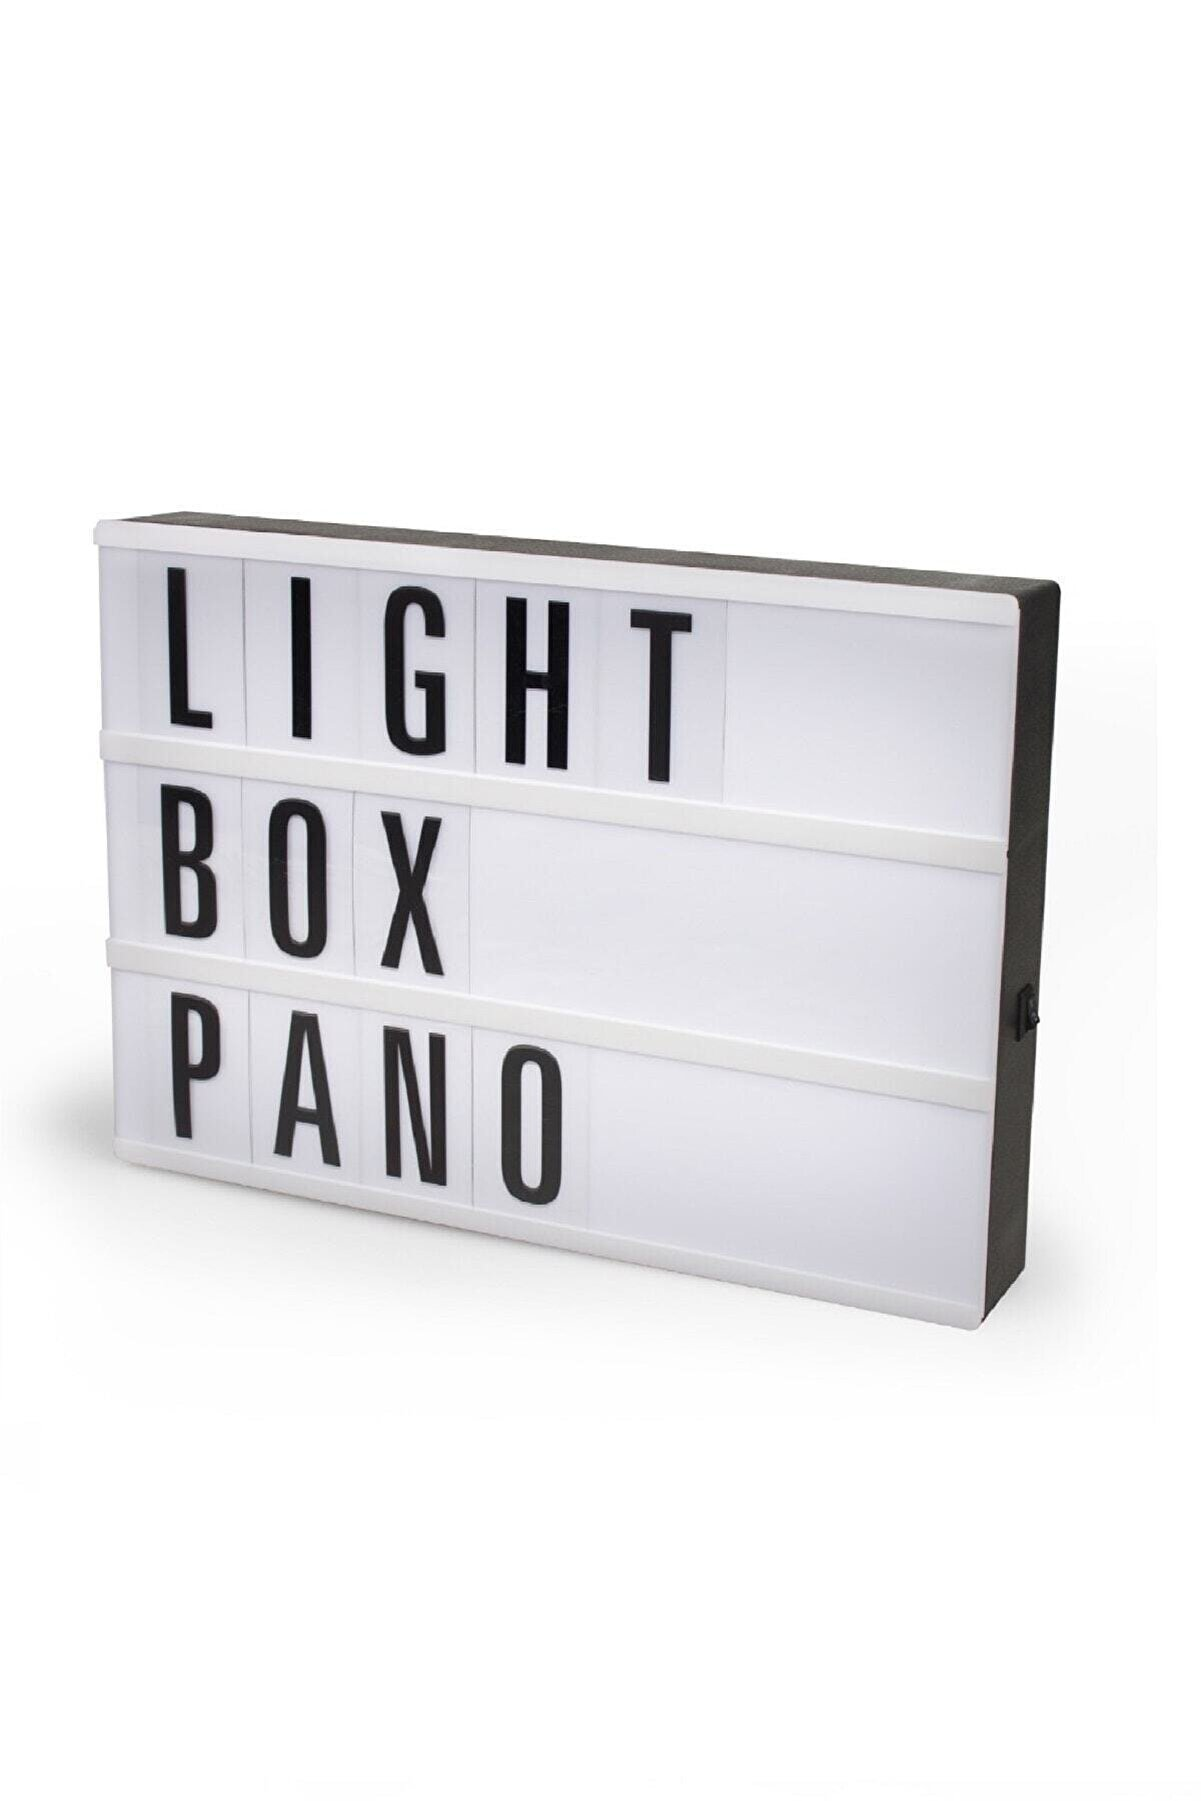 Petrix Lightbox A4 Led Işık Işıklı Mesaj Panosu 96 Harf Light Box Pano